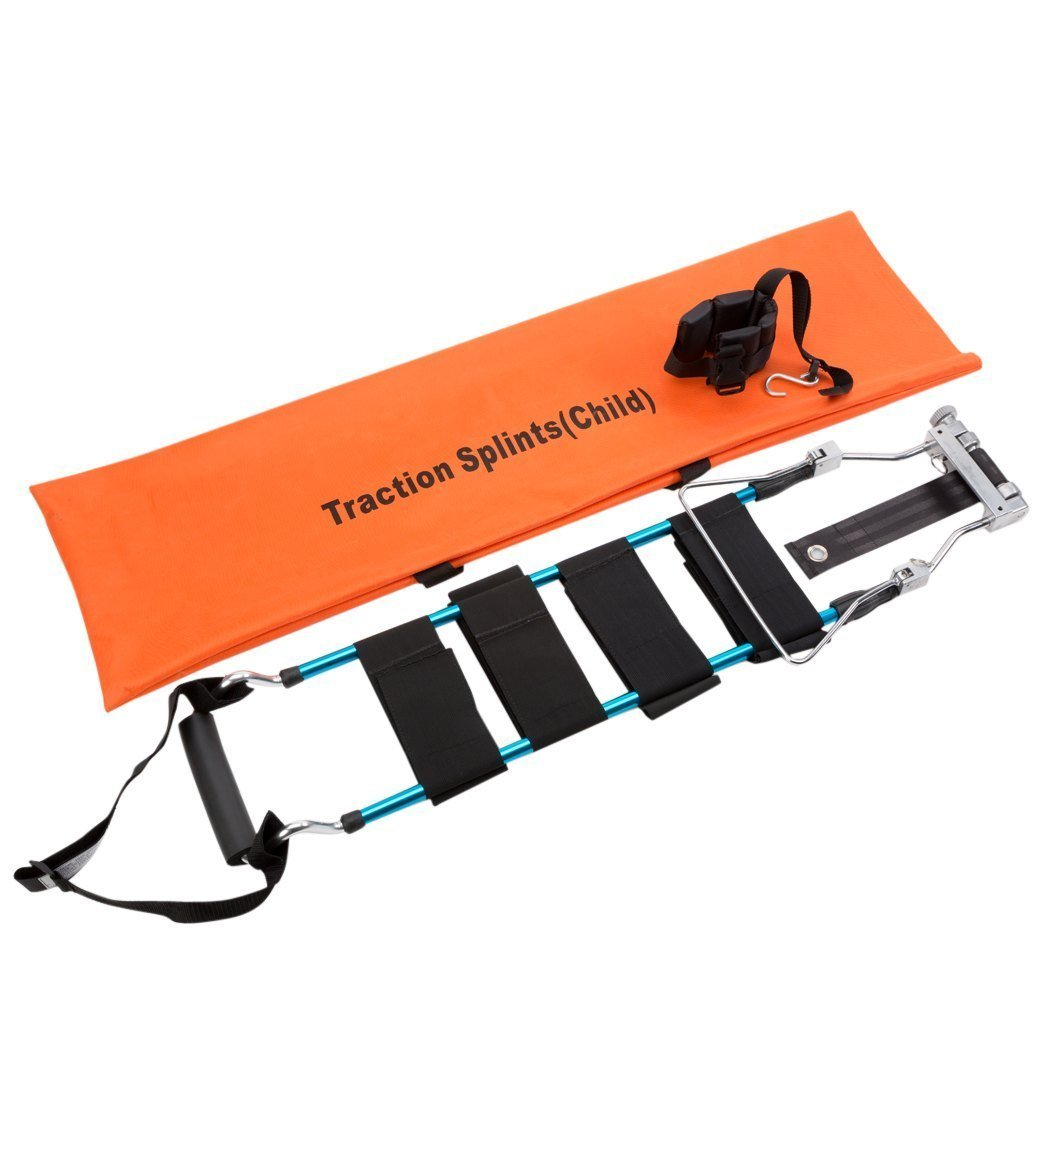 LINE2design Traction Splint Child-Pediatric Carrying Case Adjustable Ankle Straps